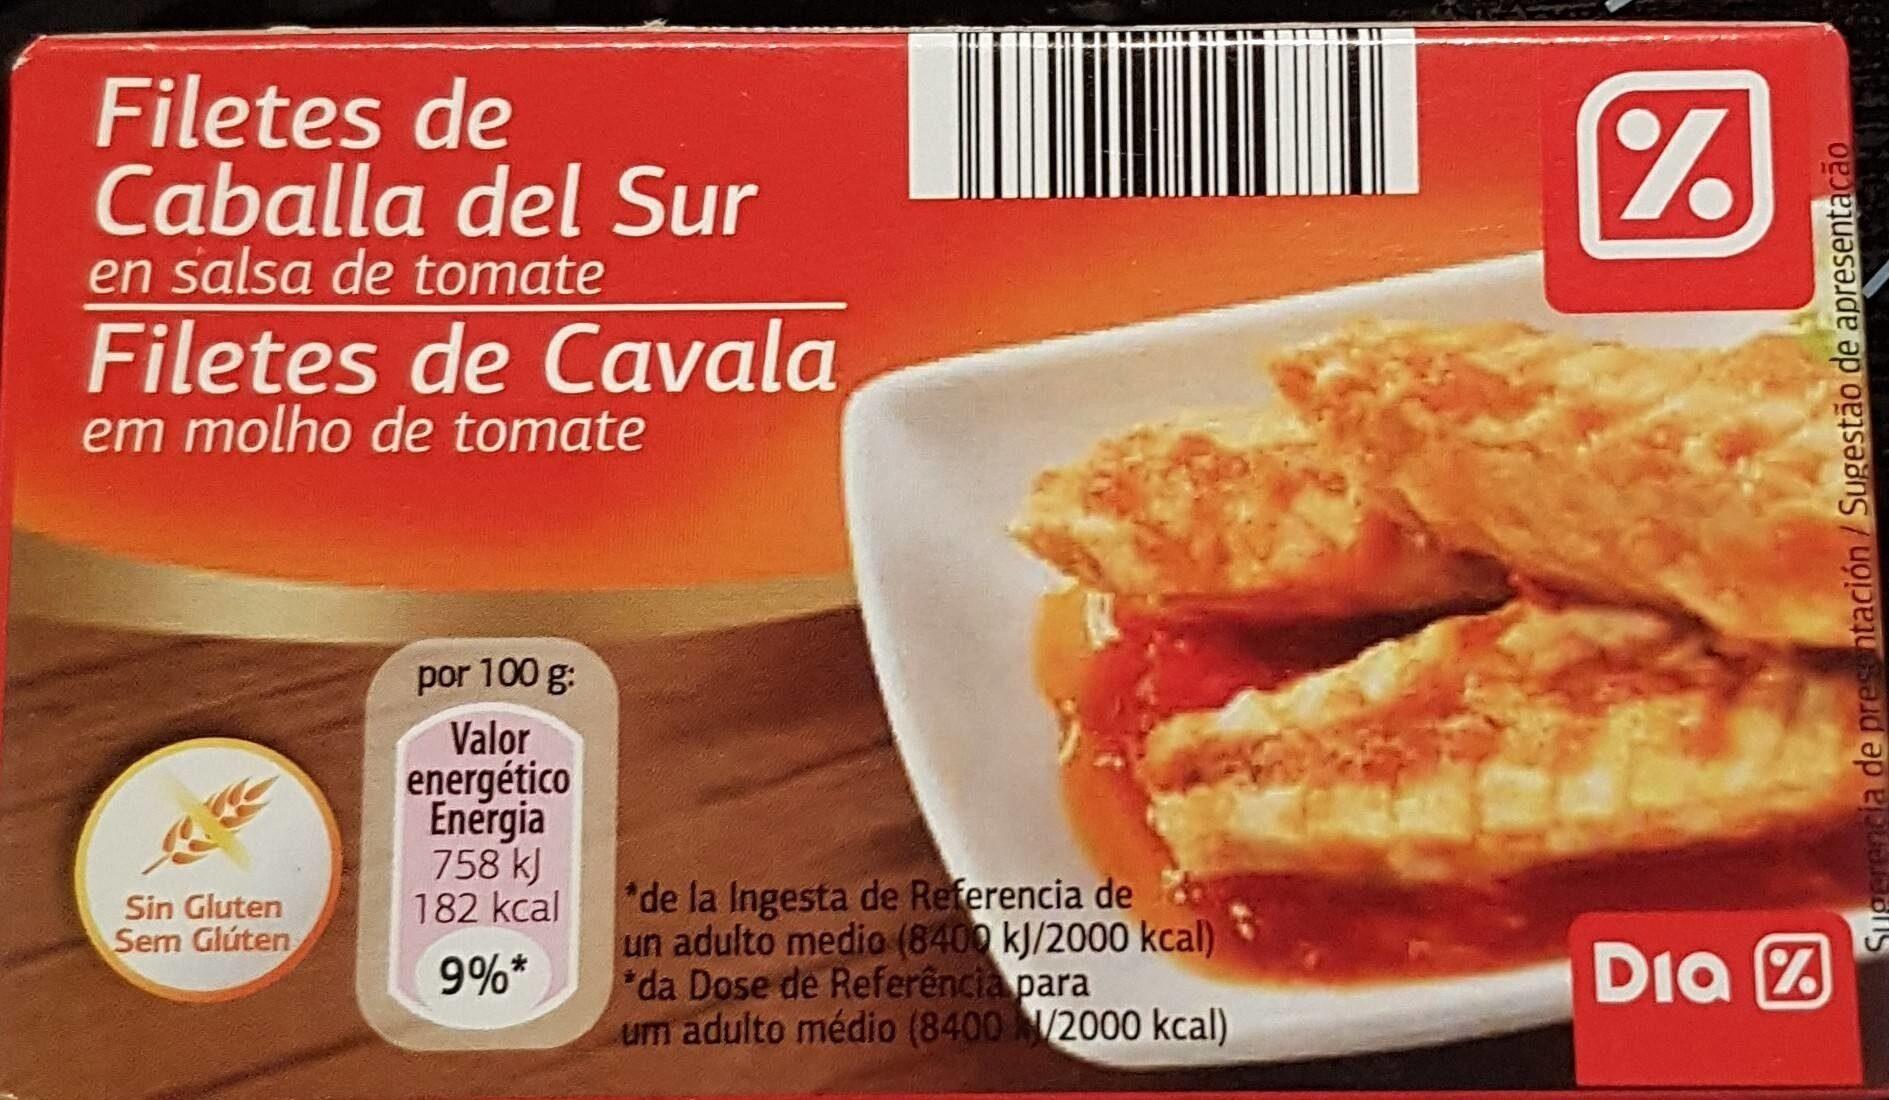 Filetes de Caballa del Sur en salsa de tomate - Producte